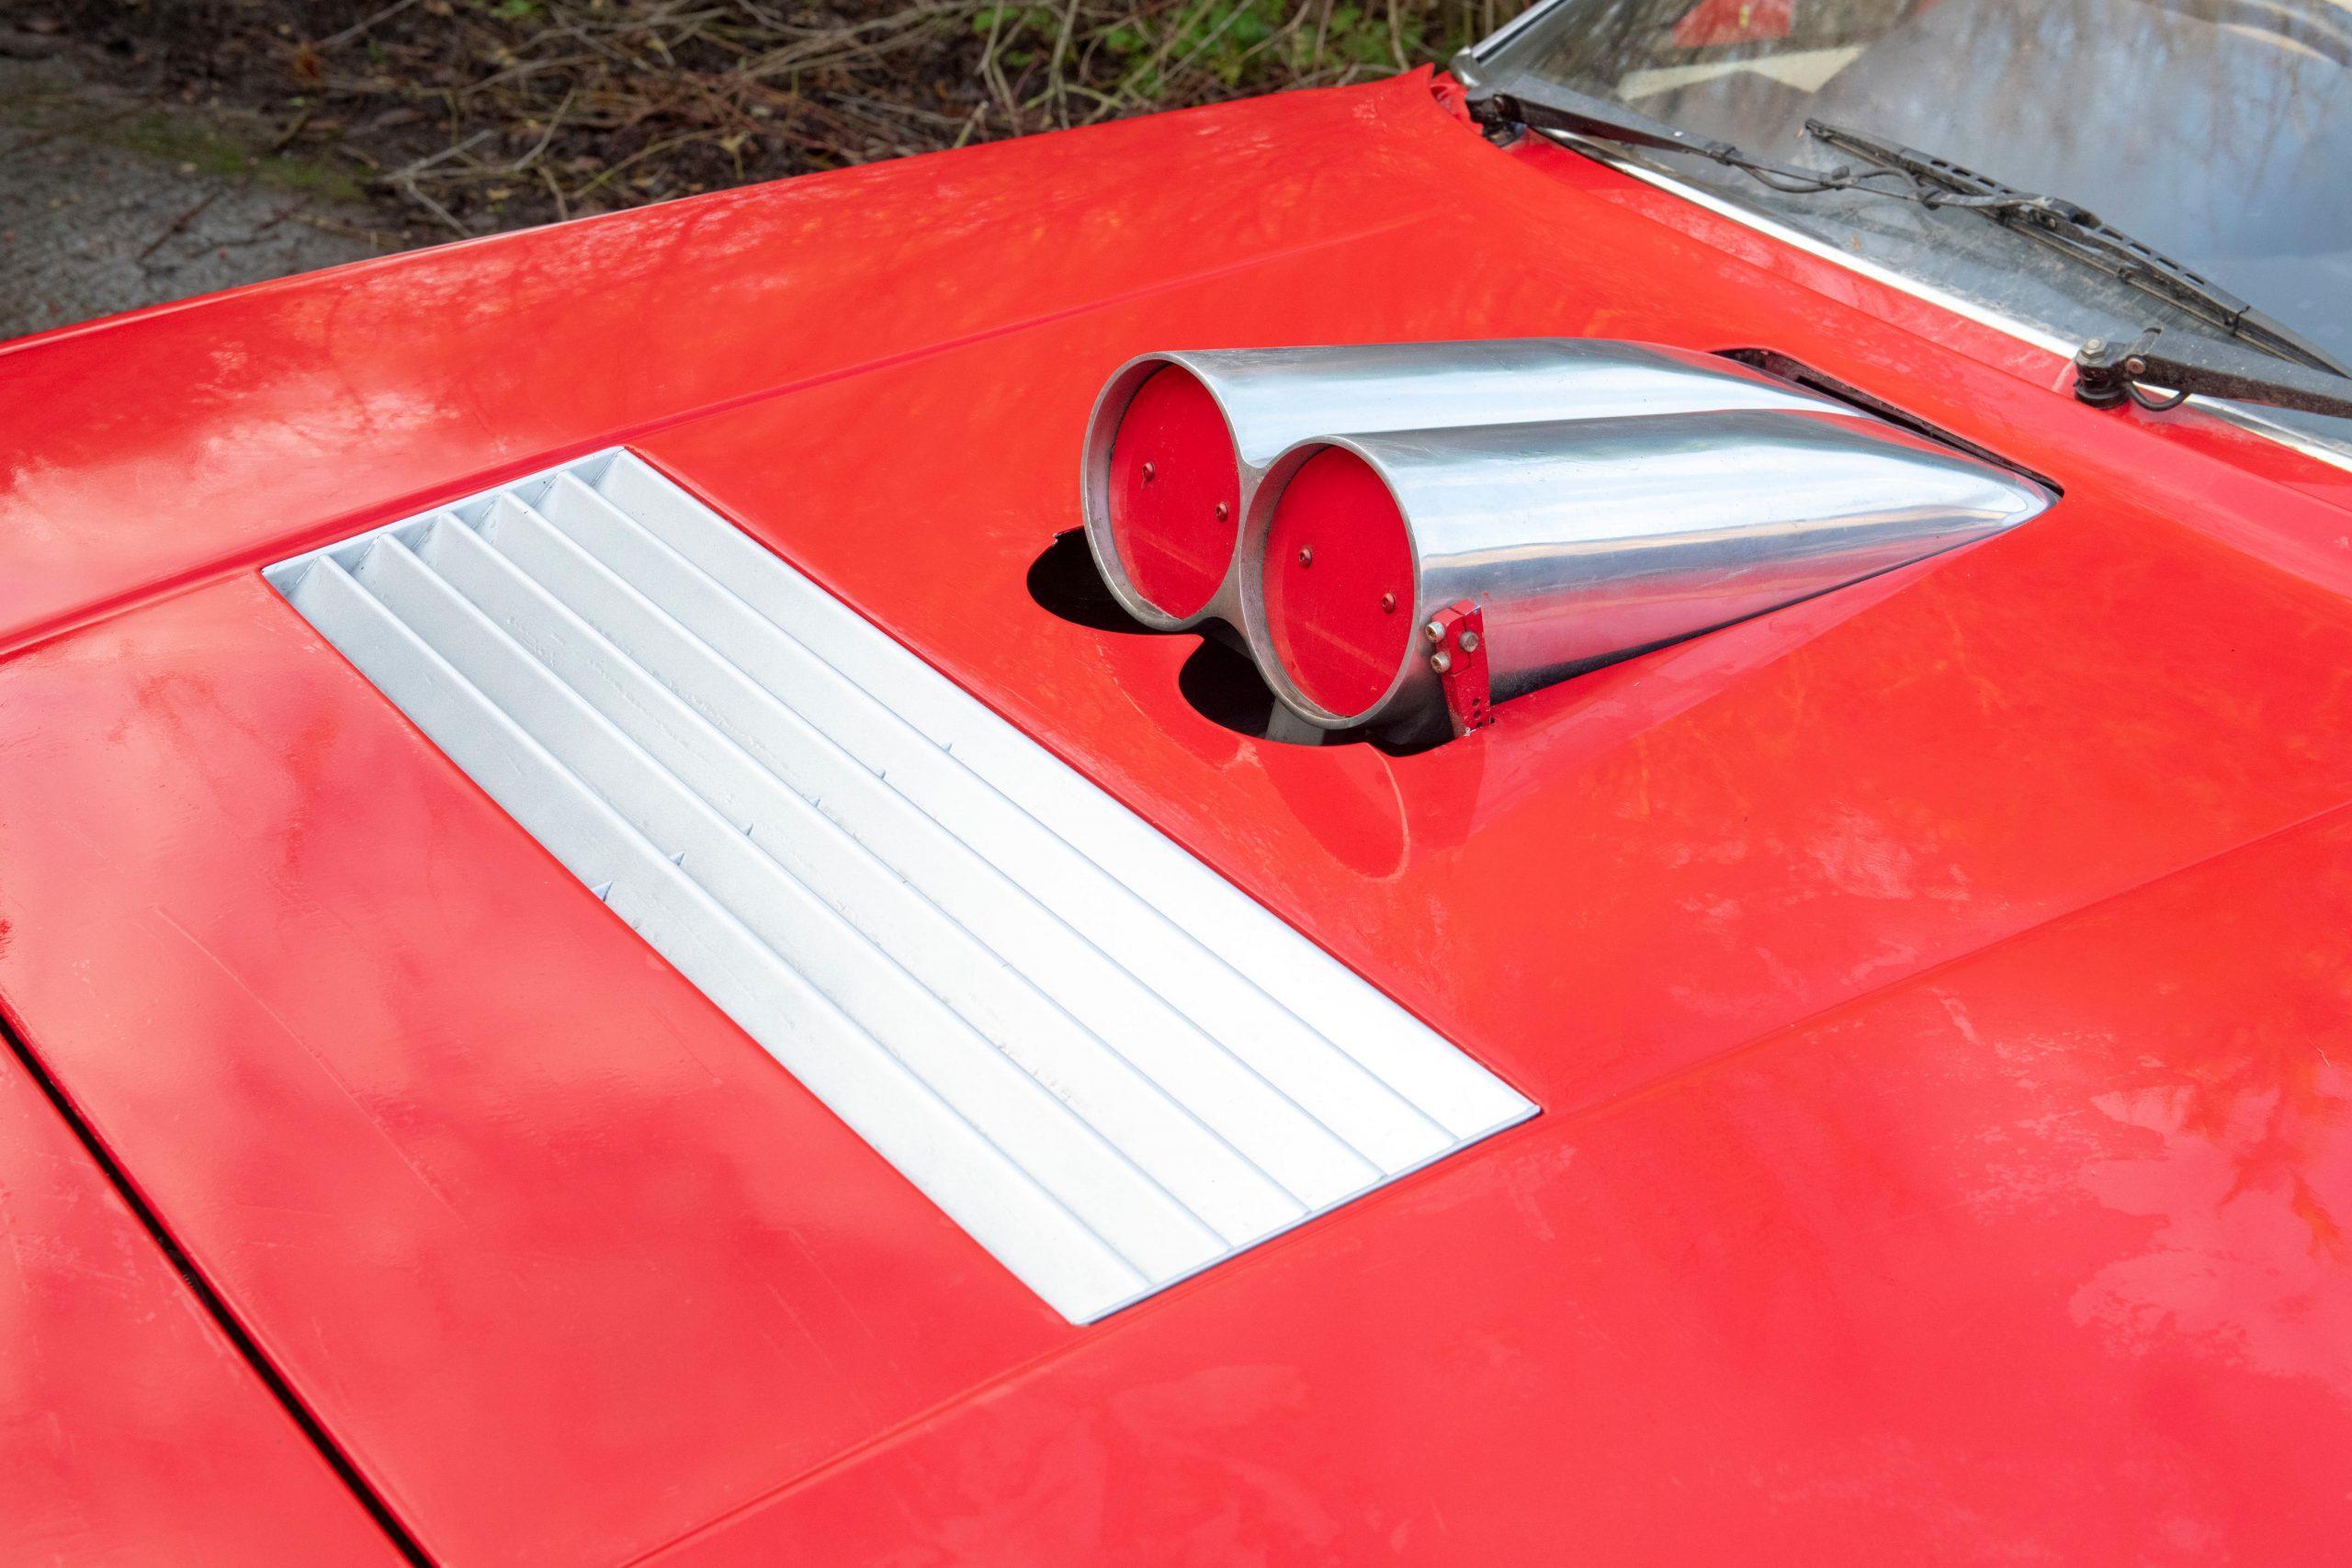 1985 Ferrari 412 Custom Pickup hood intake